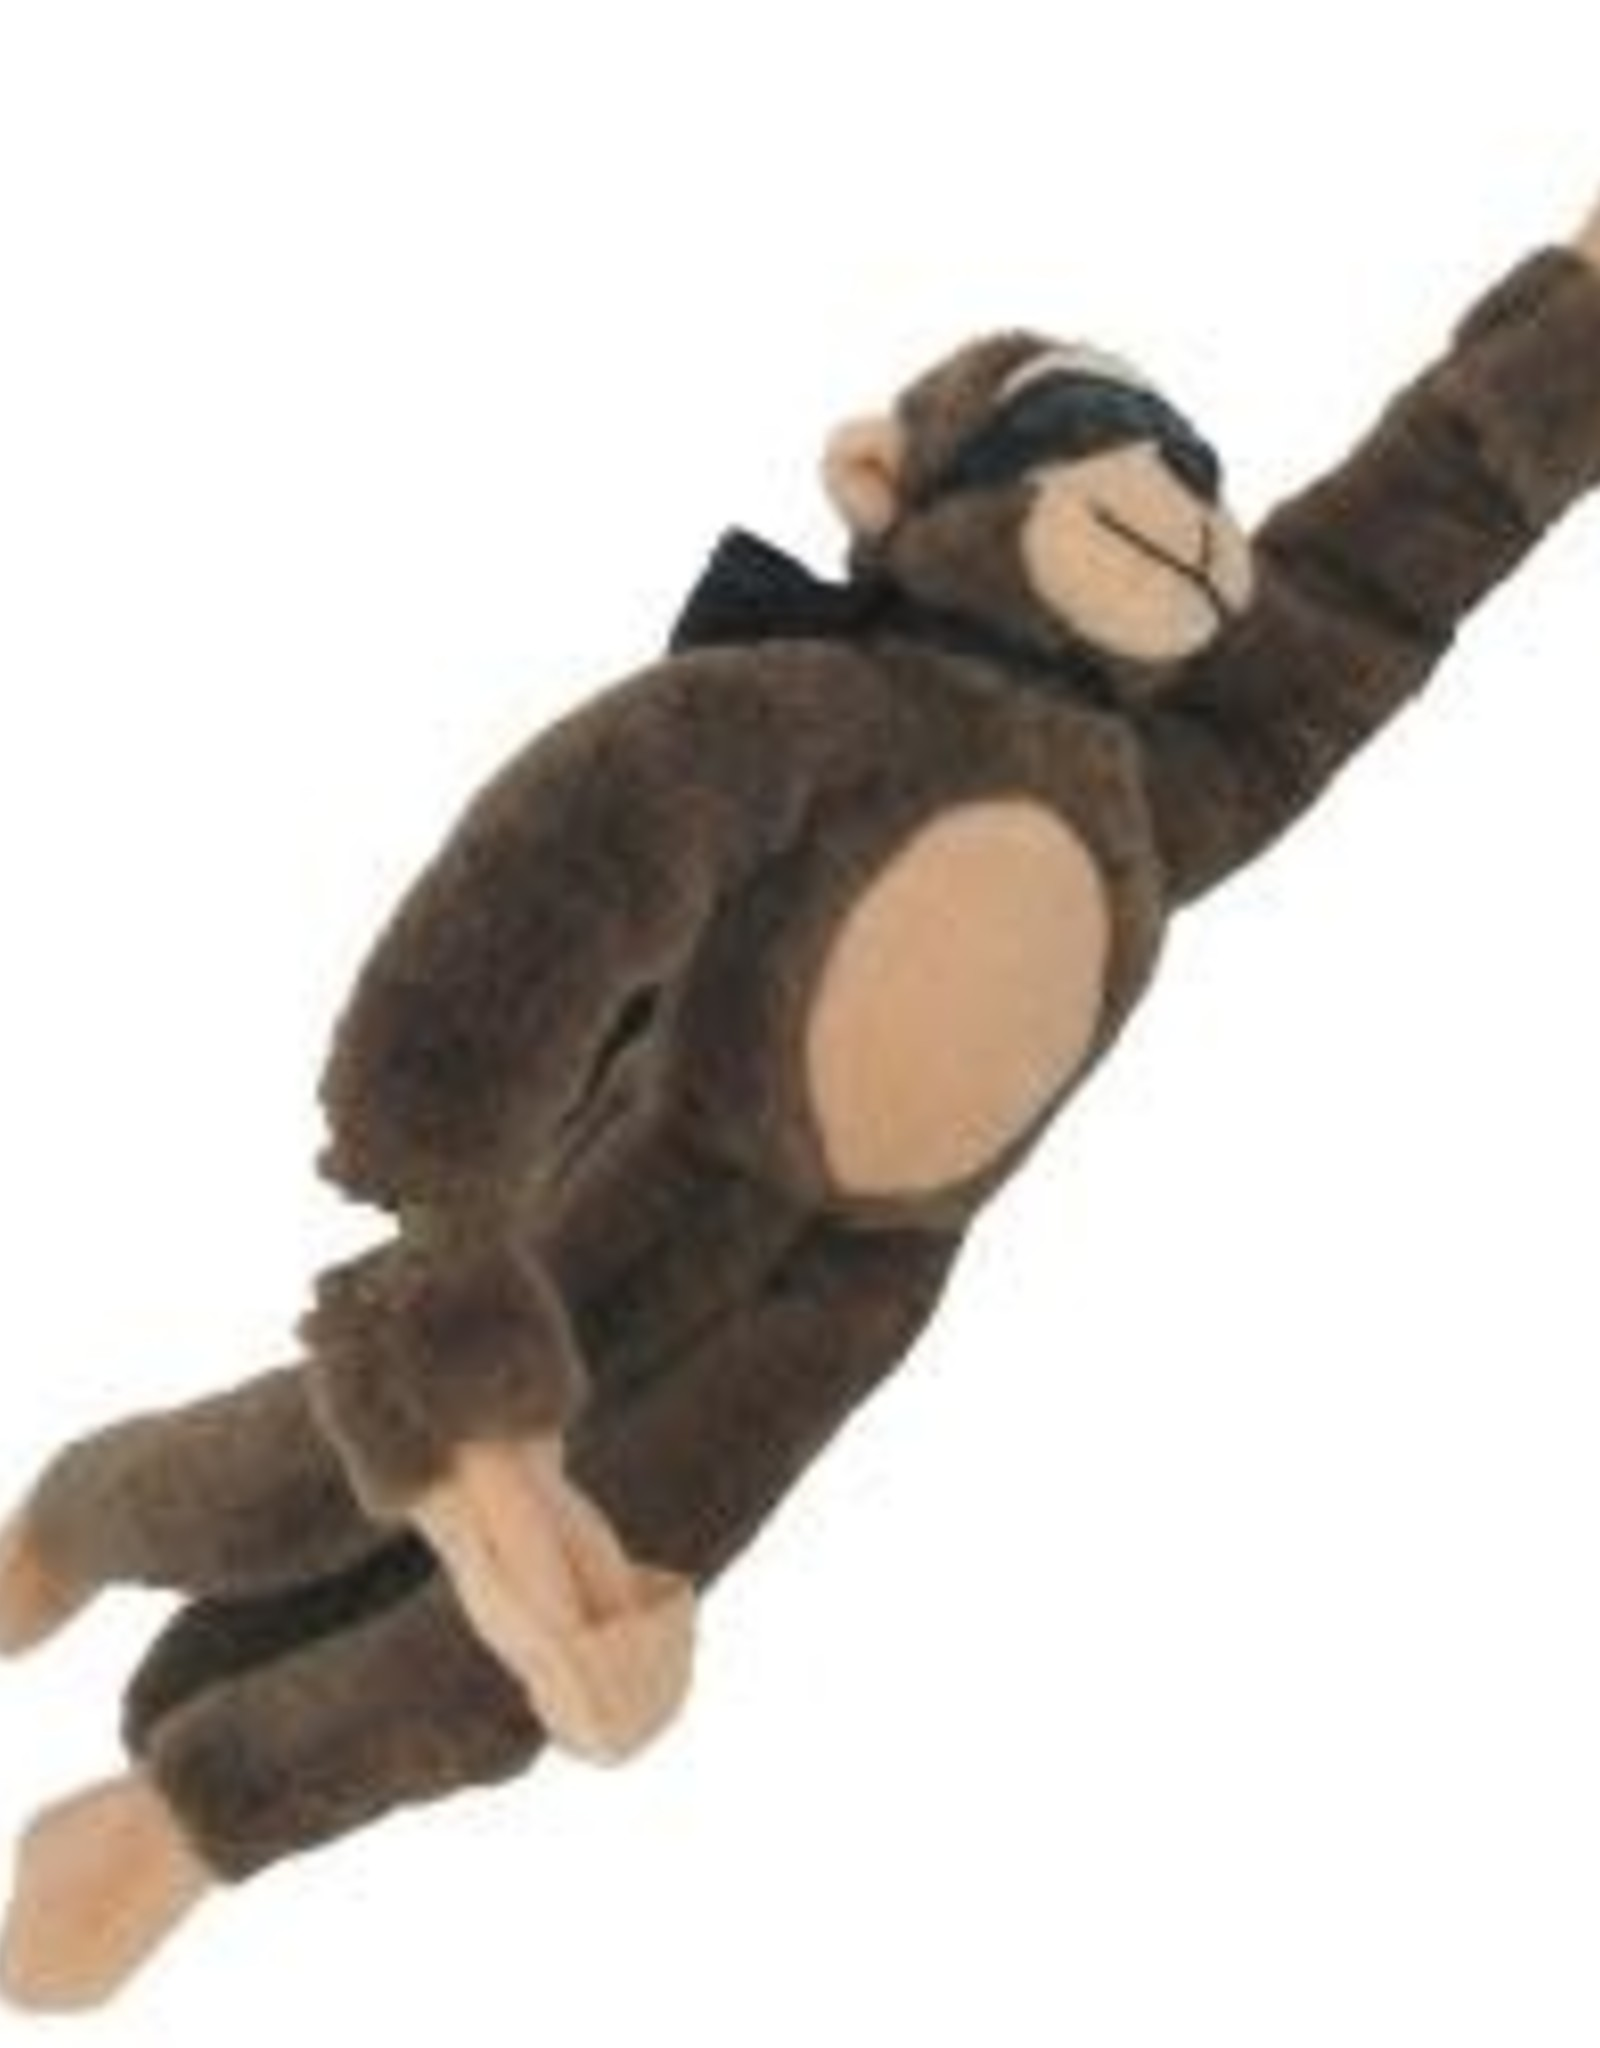 Hayes Specialties Fling Shot Flying Monkey